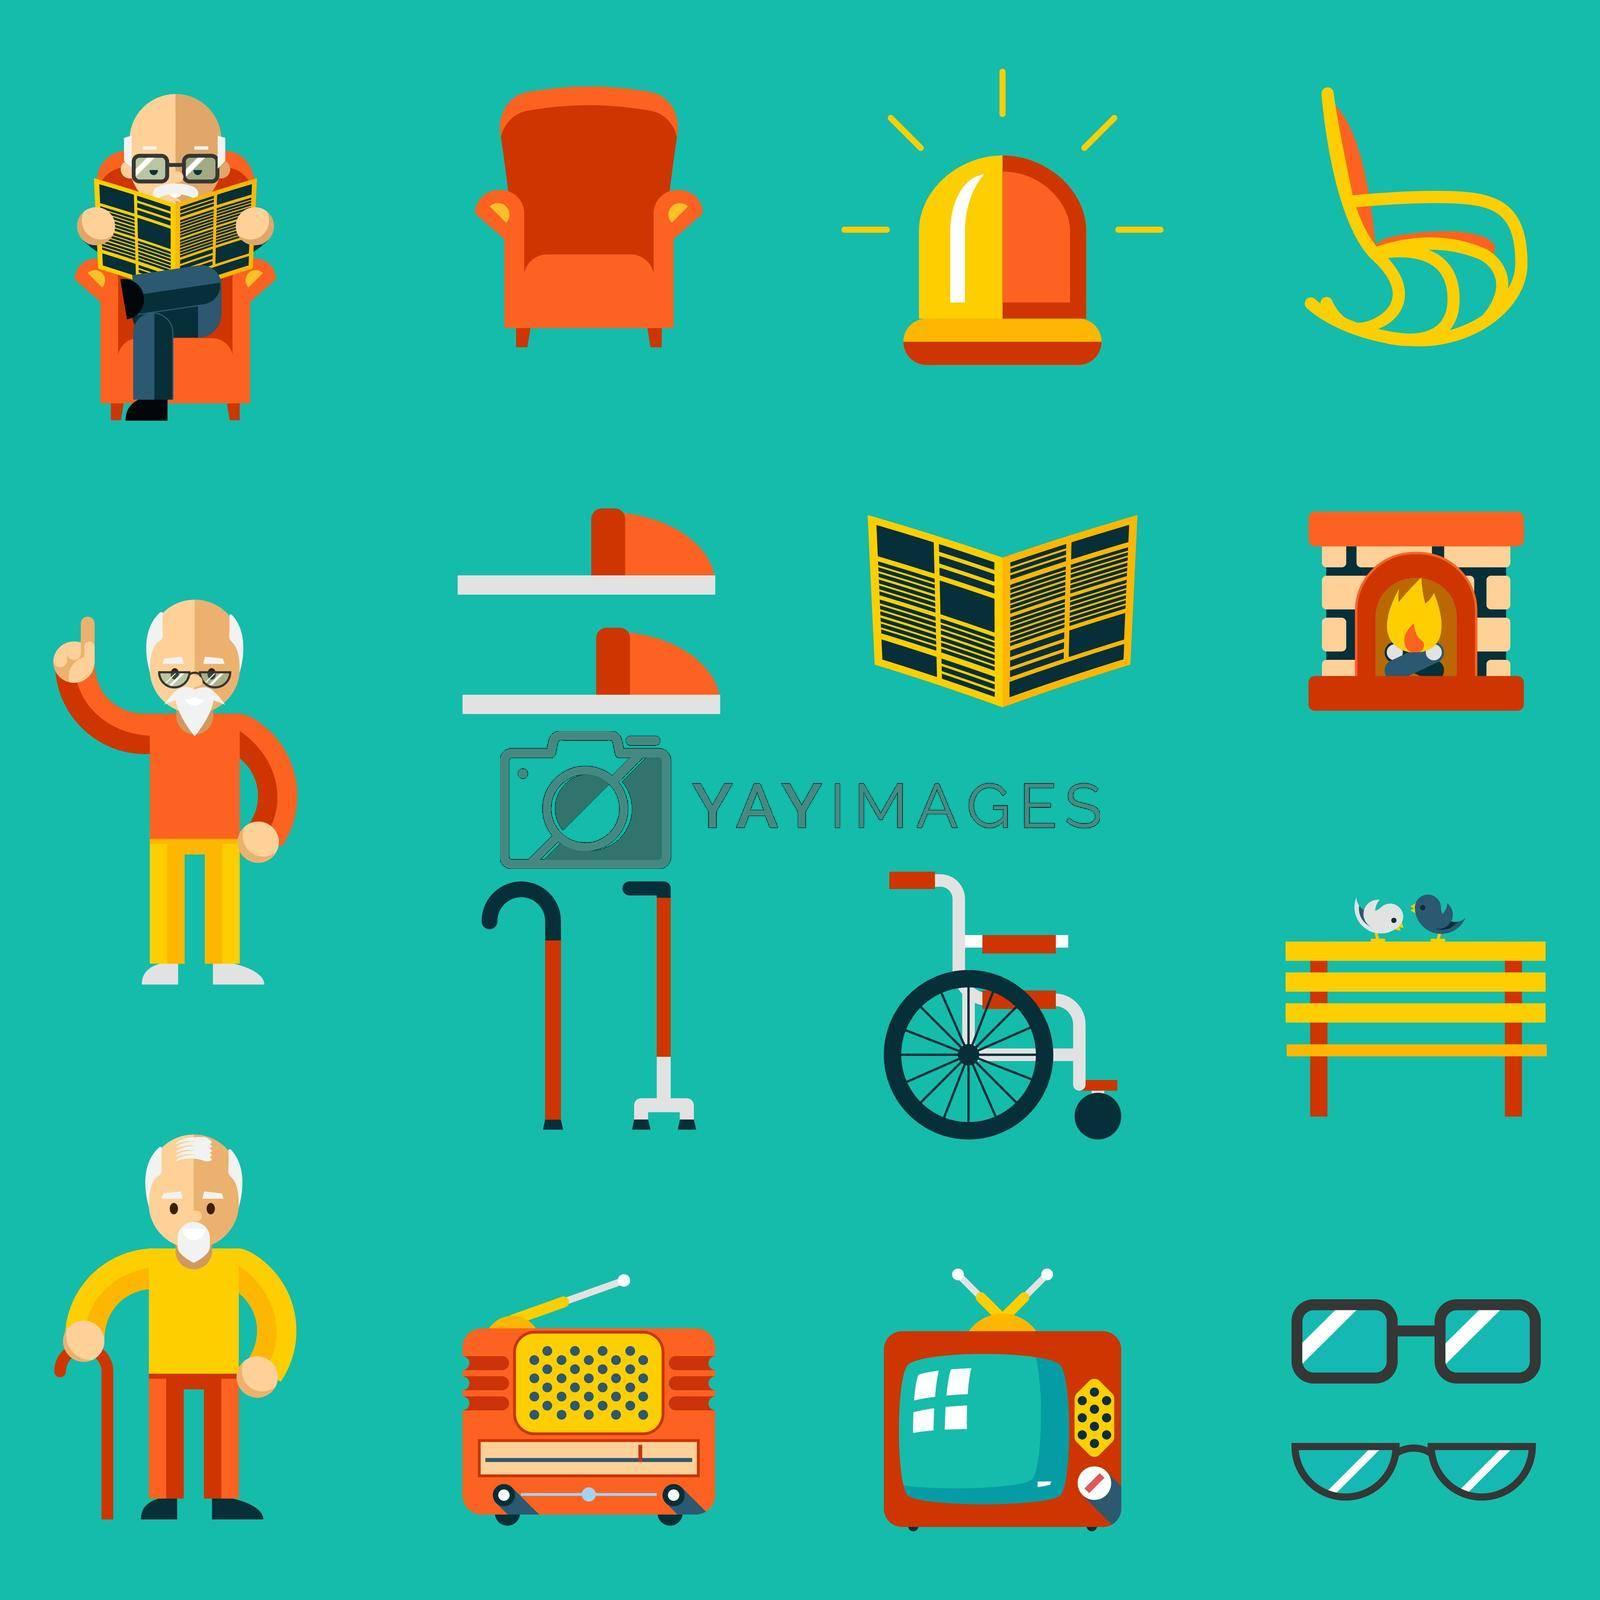 Royalty free image of Elderly people icons by mstjahanara